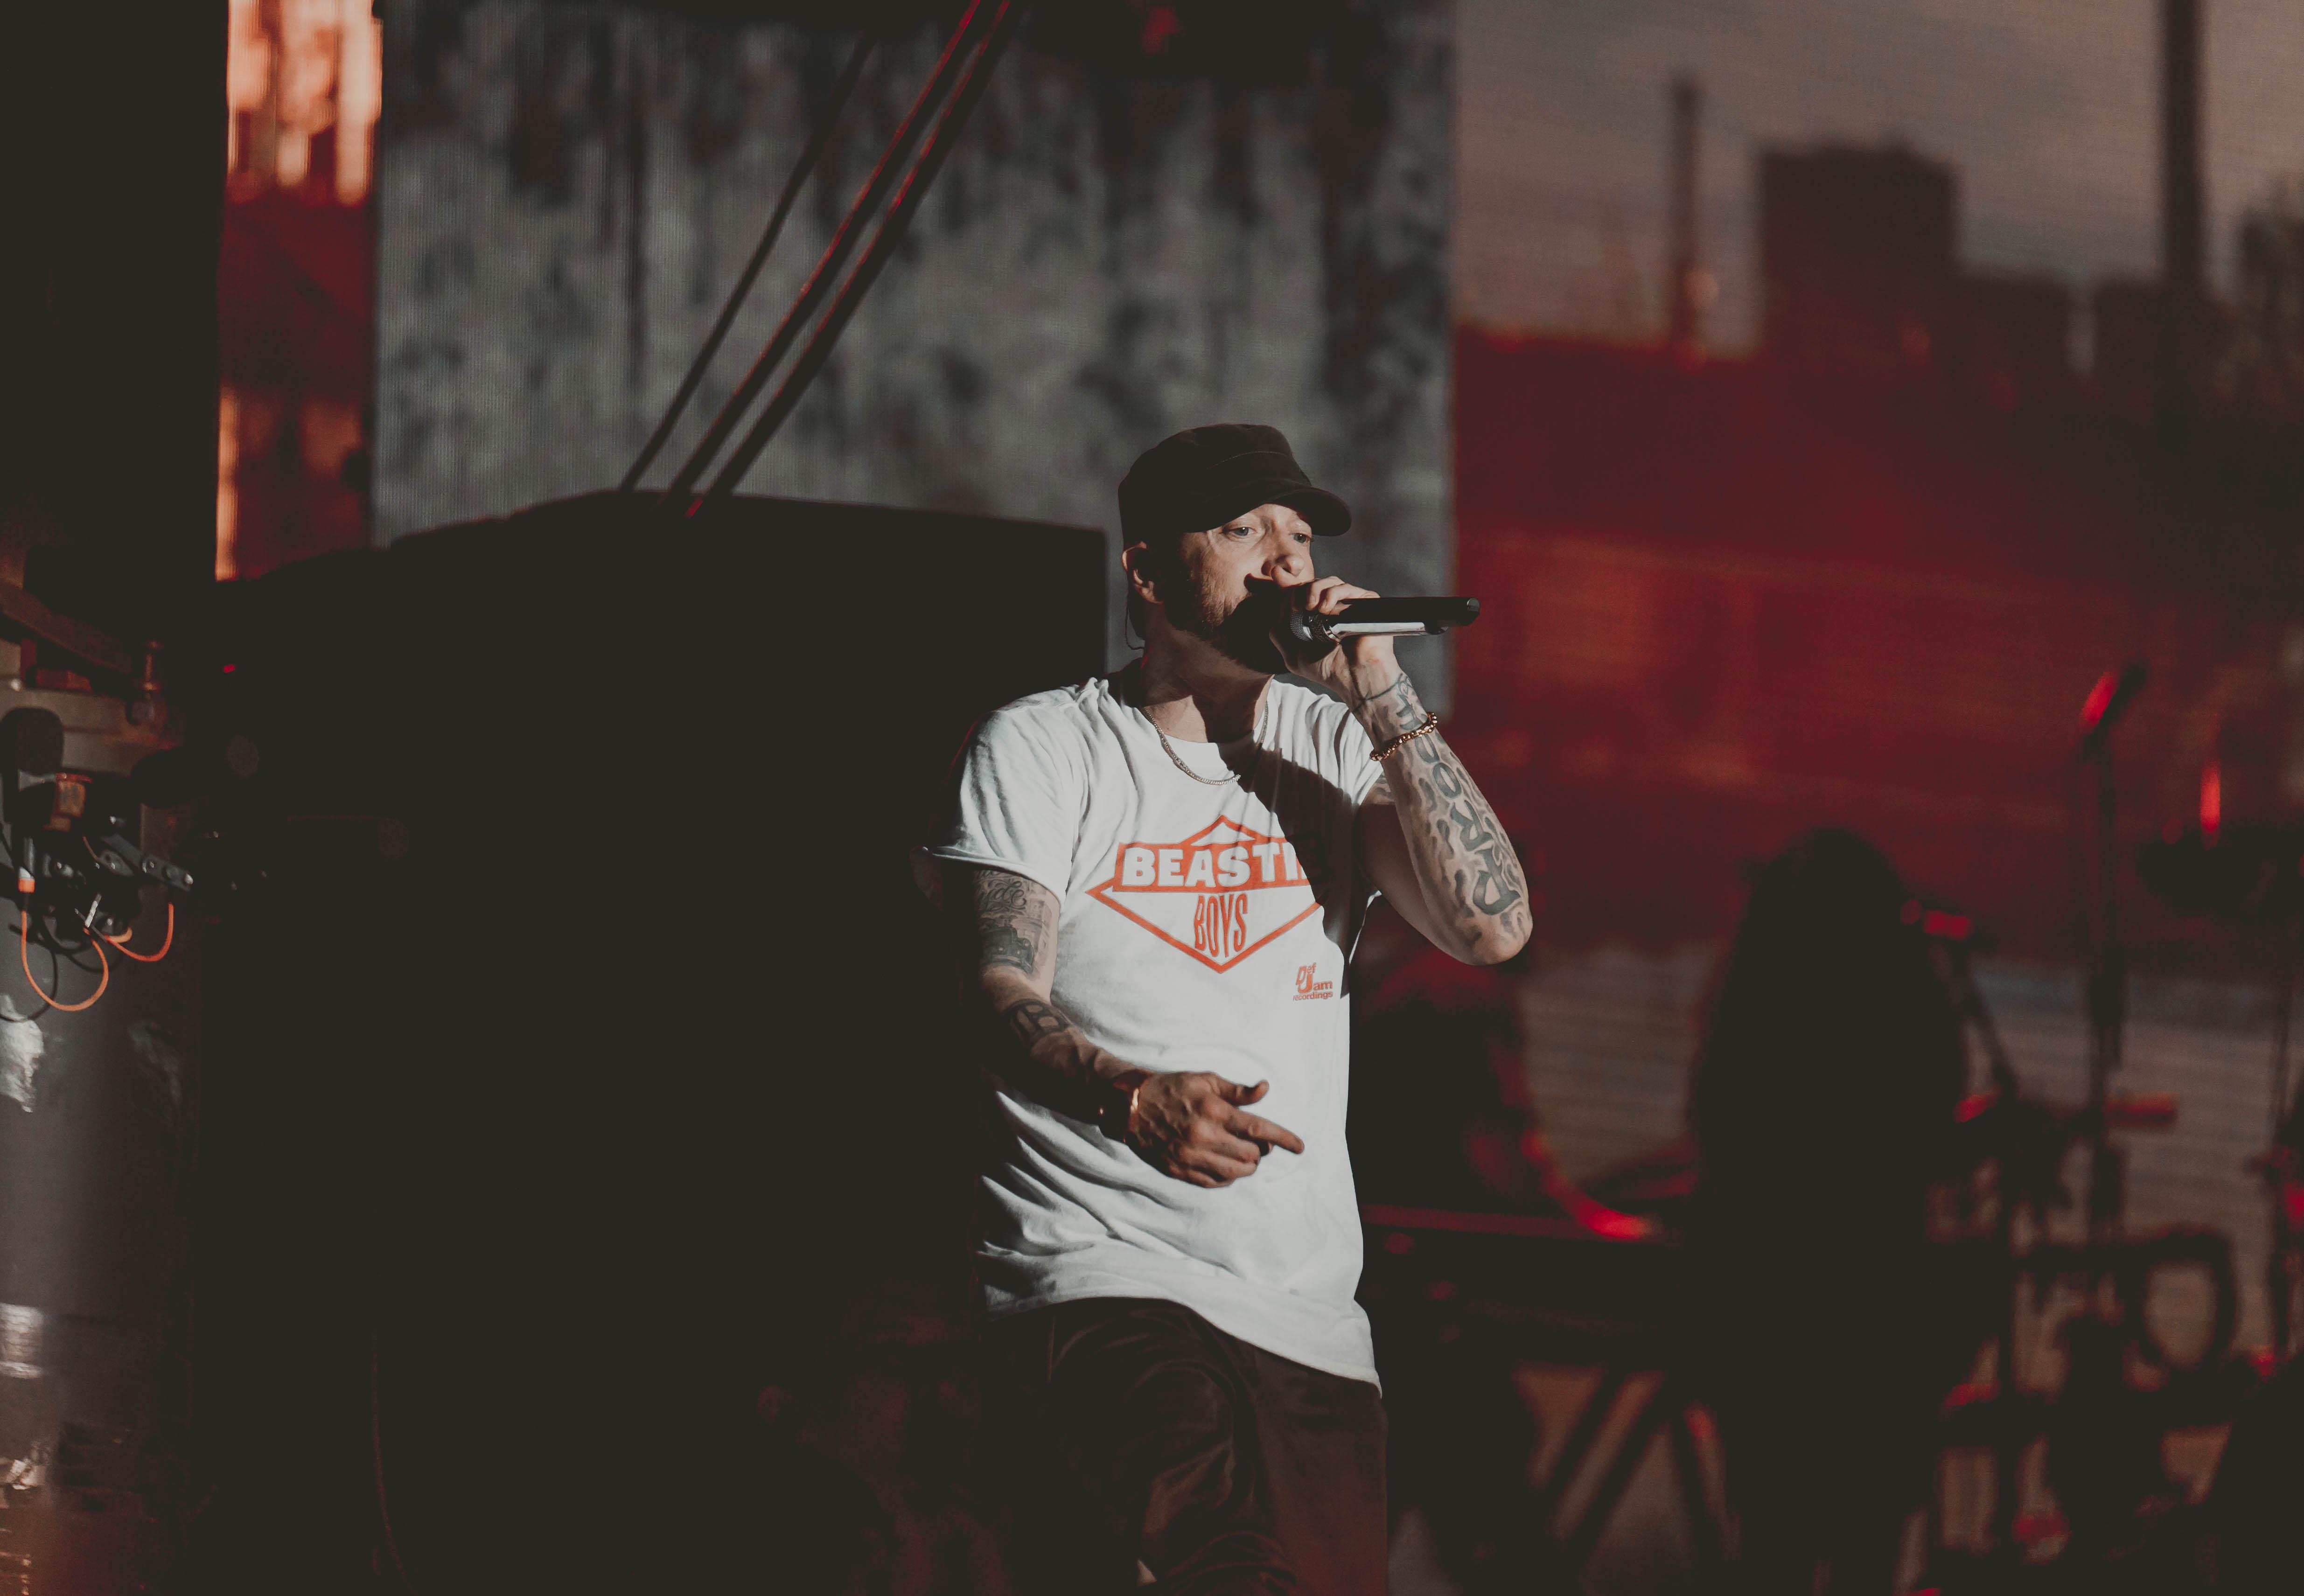 Eminem live at Firefly Music Festival 2018 by Christian Sarkine, Eminem.Pro